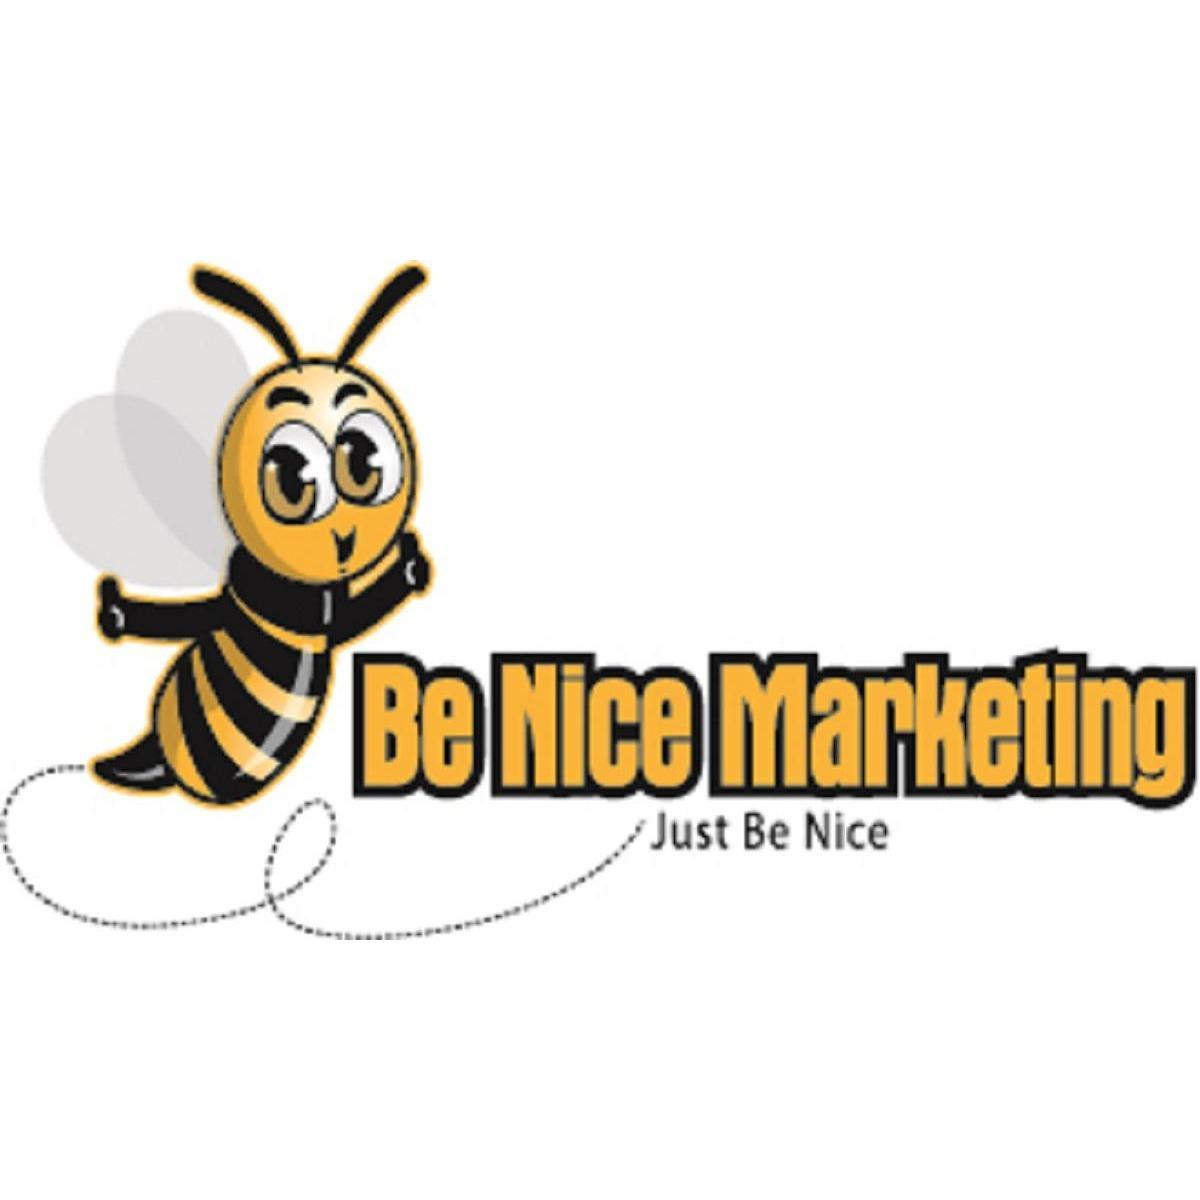 Be Nice Marketing - Lebanon, OH 45036 - (937)673-5187 | ShowMeLocal.com